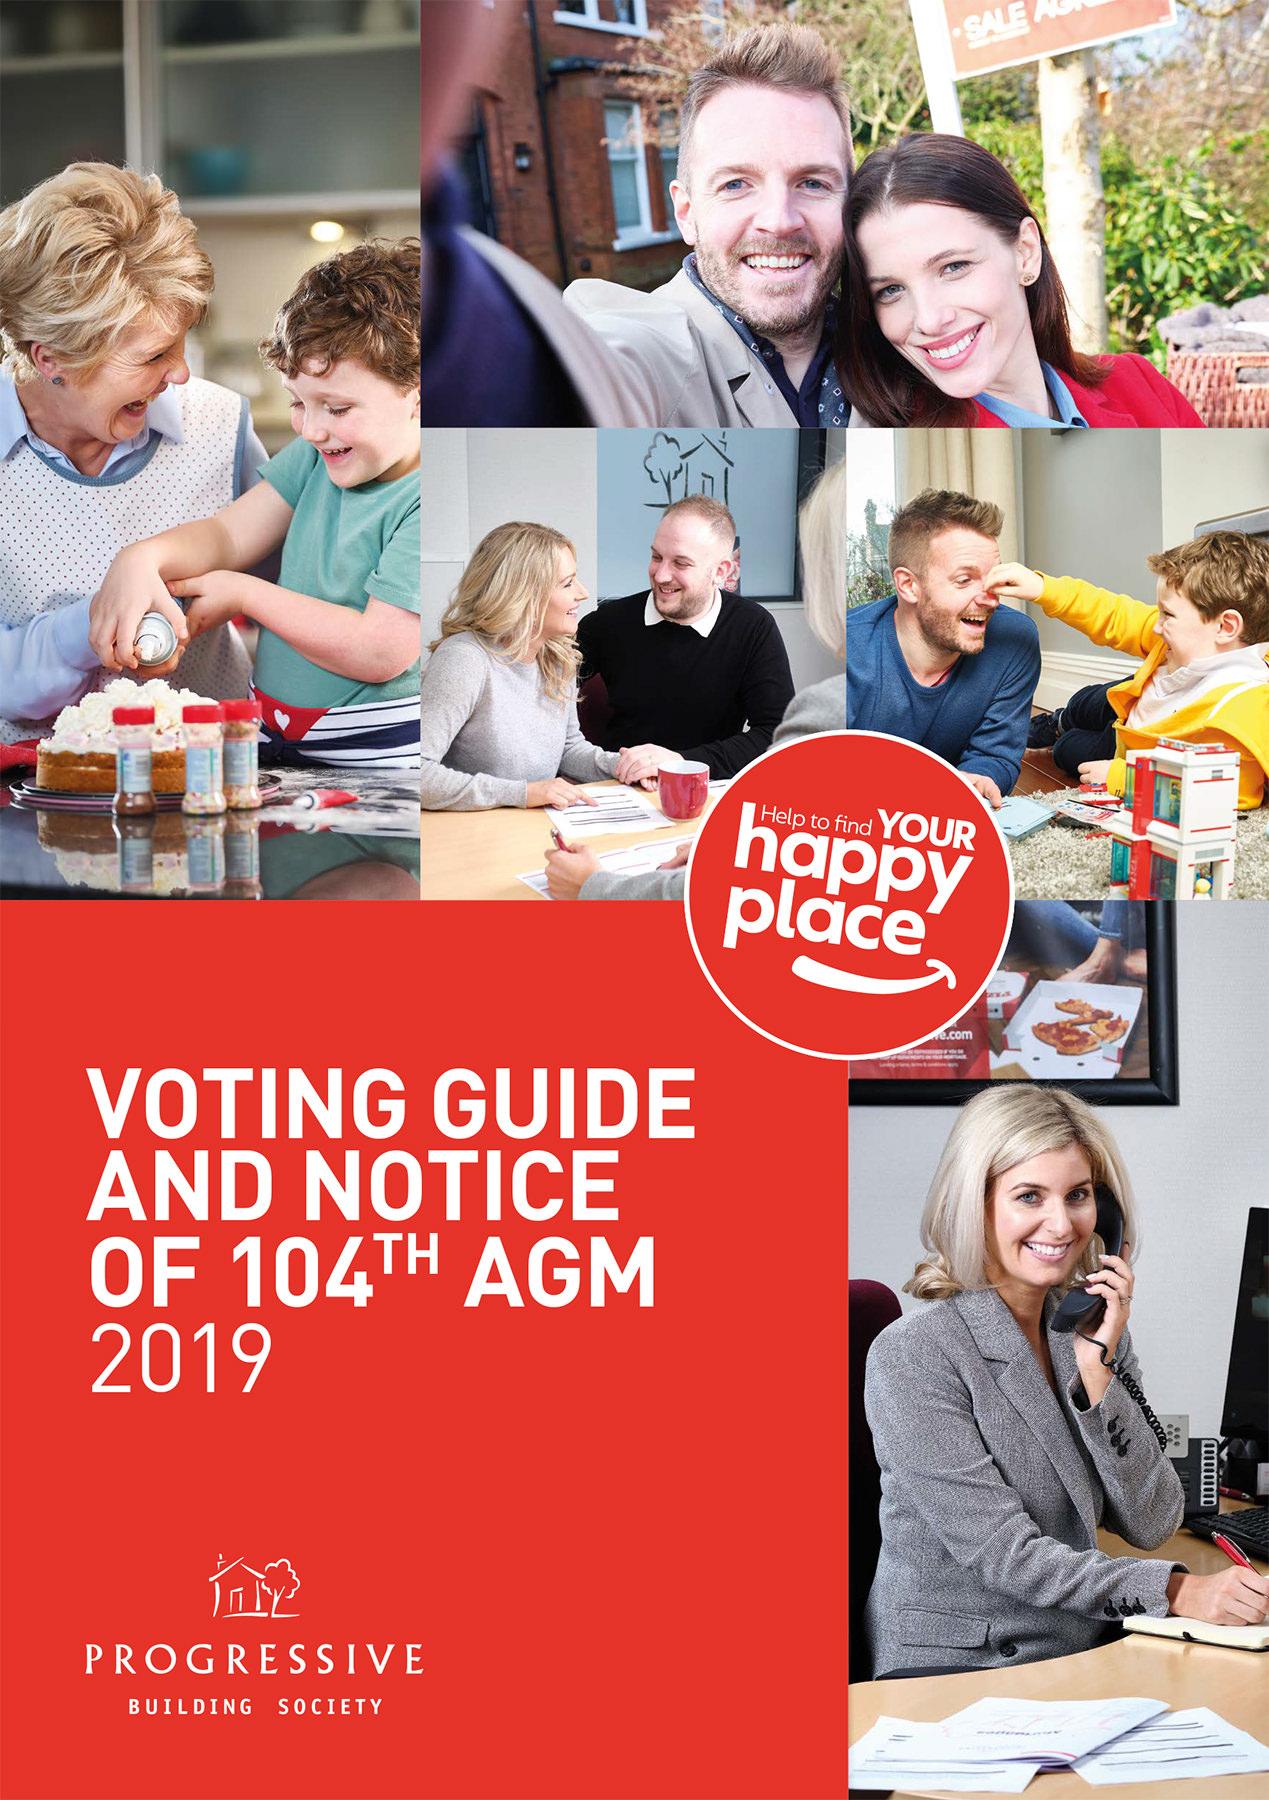 008881 Progressive AGM Voting Guide A5 v8_WEB-1.jpg